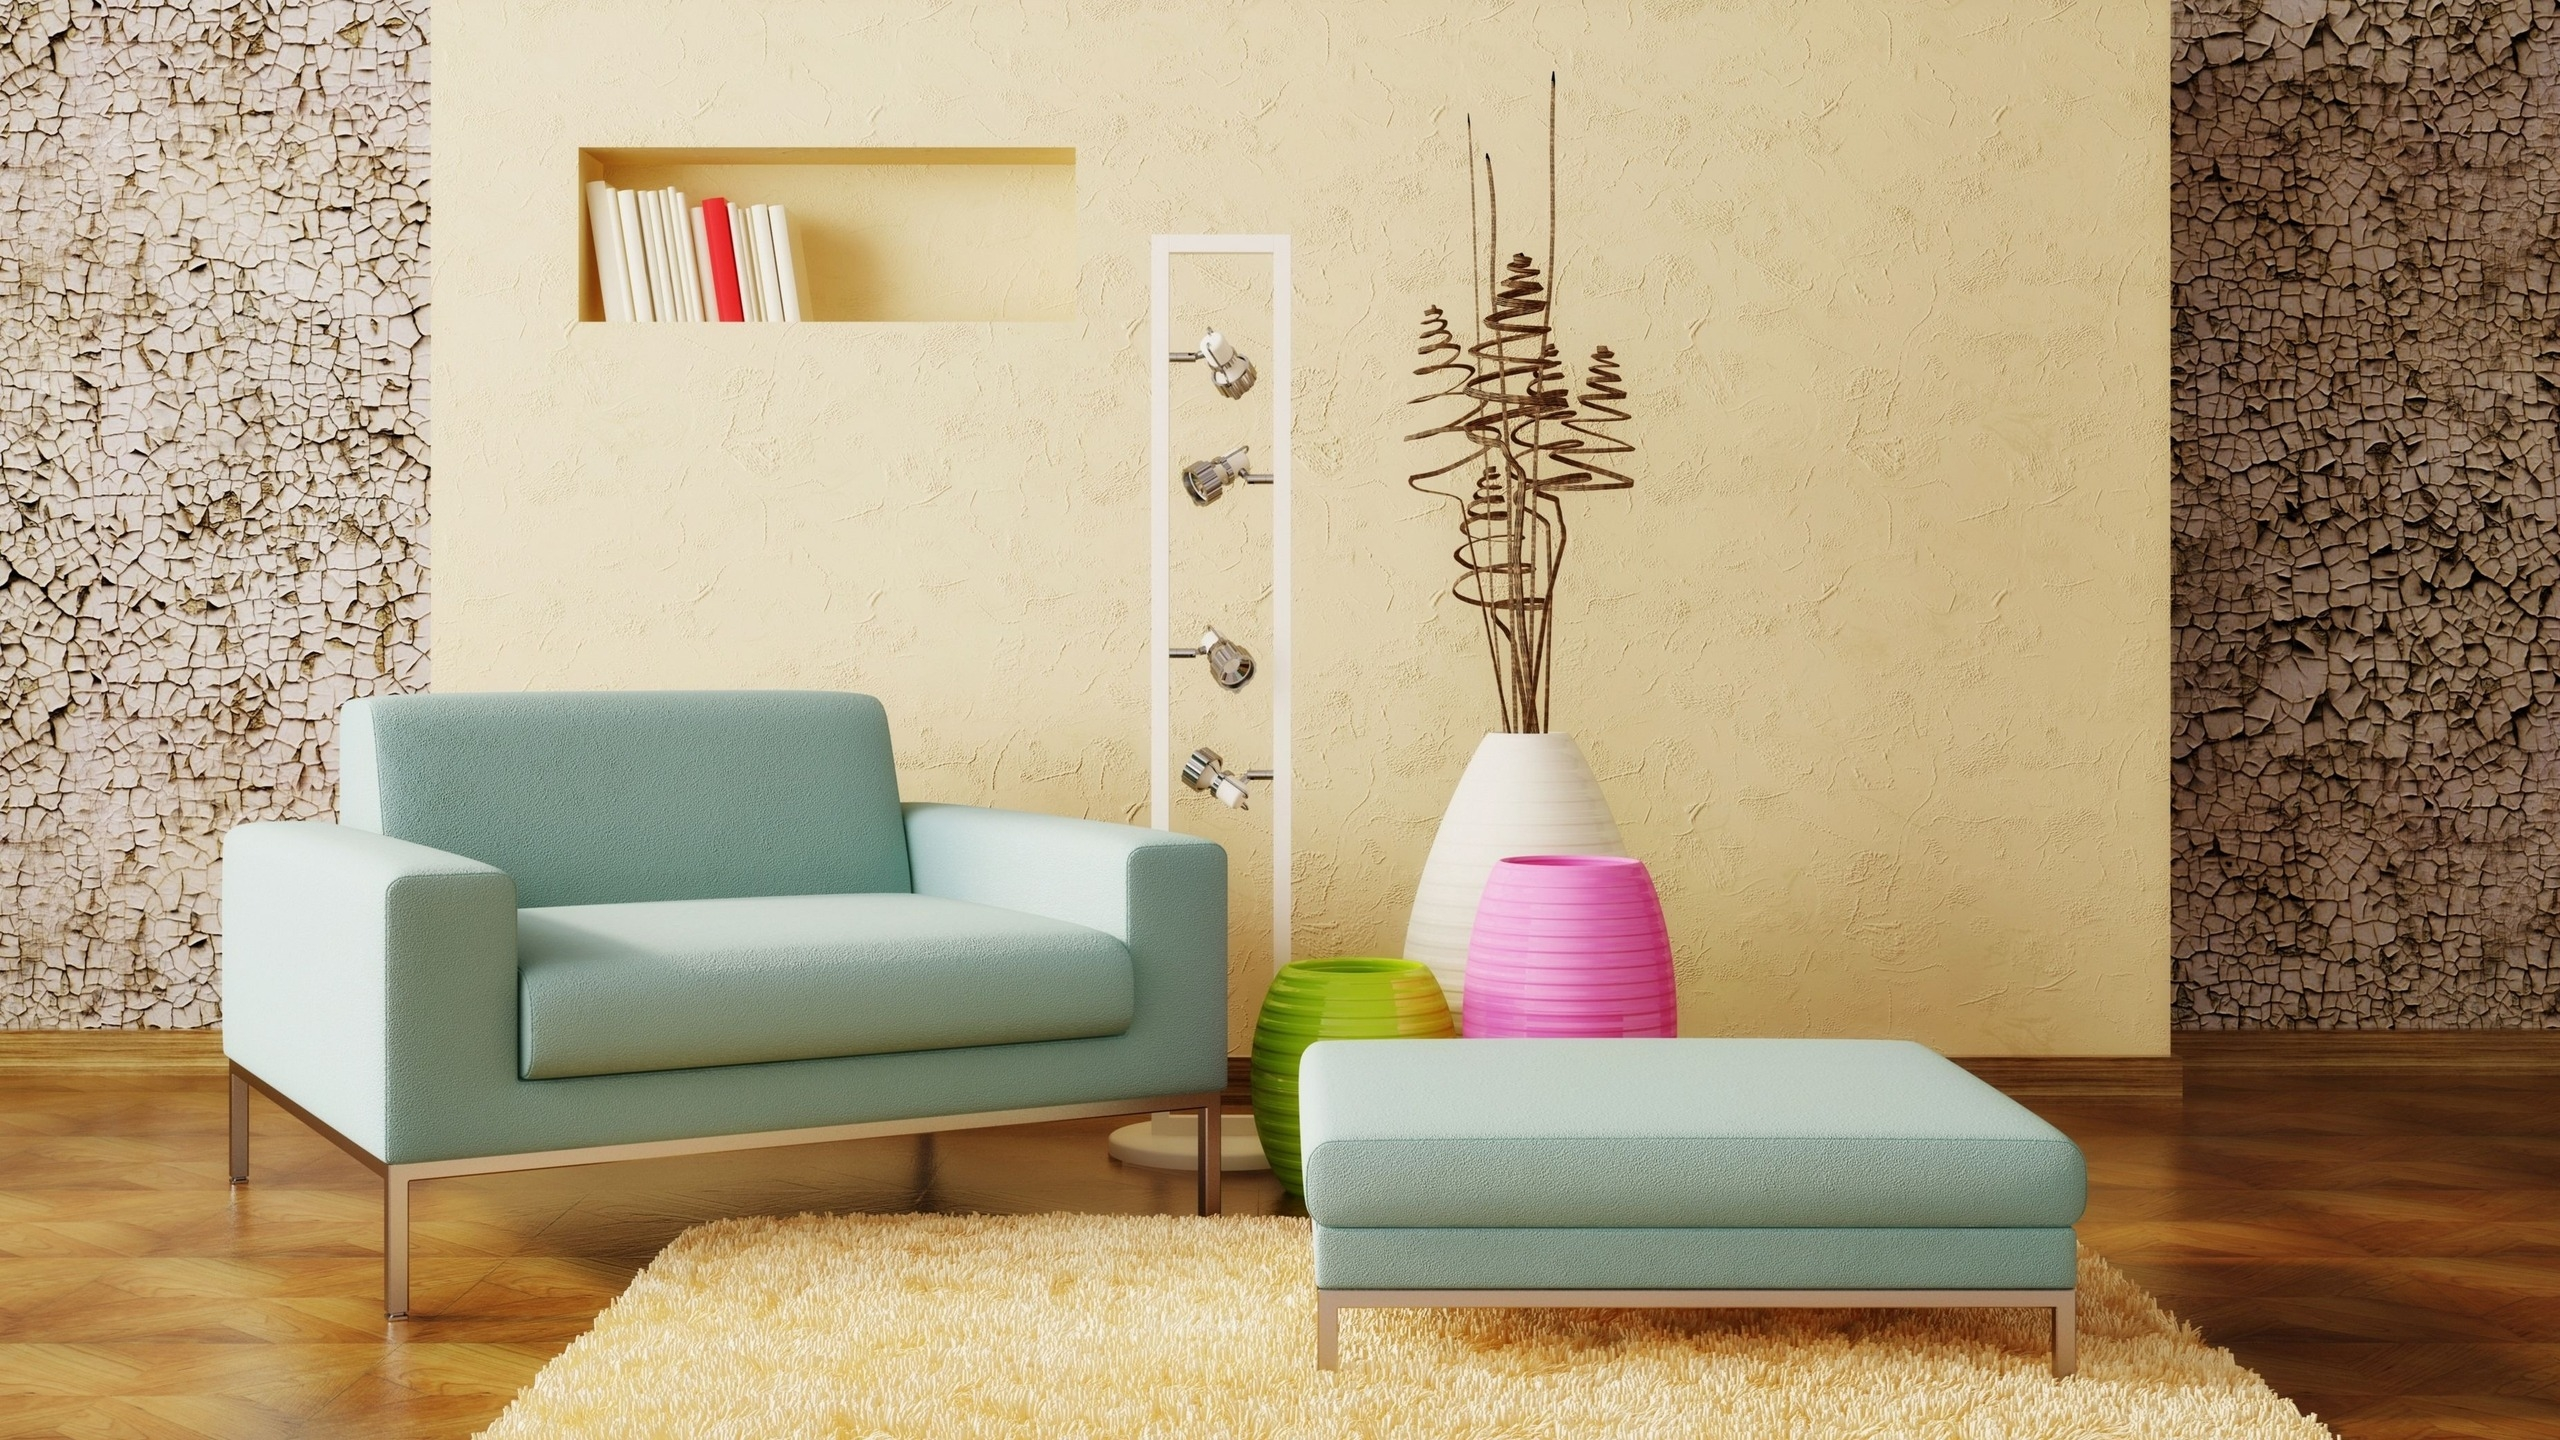 Wallpaper For Interior Walls 20 Designs Enhancedhomes Org